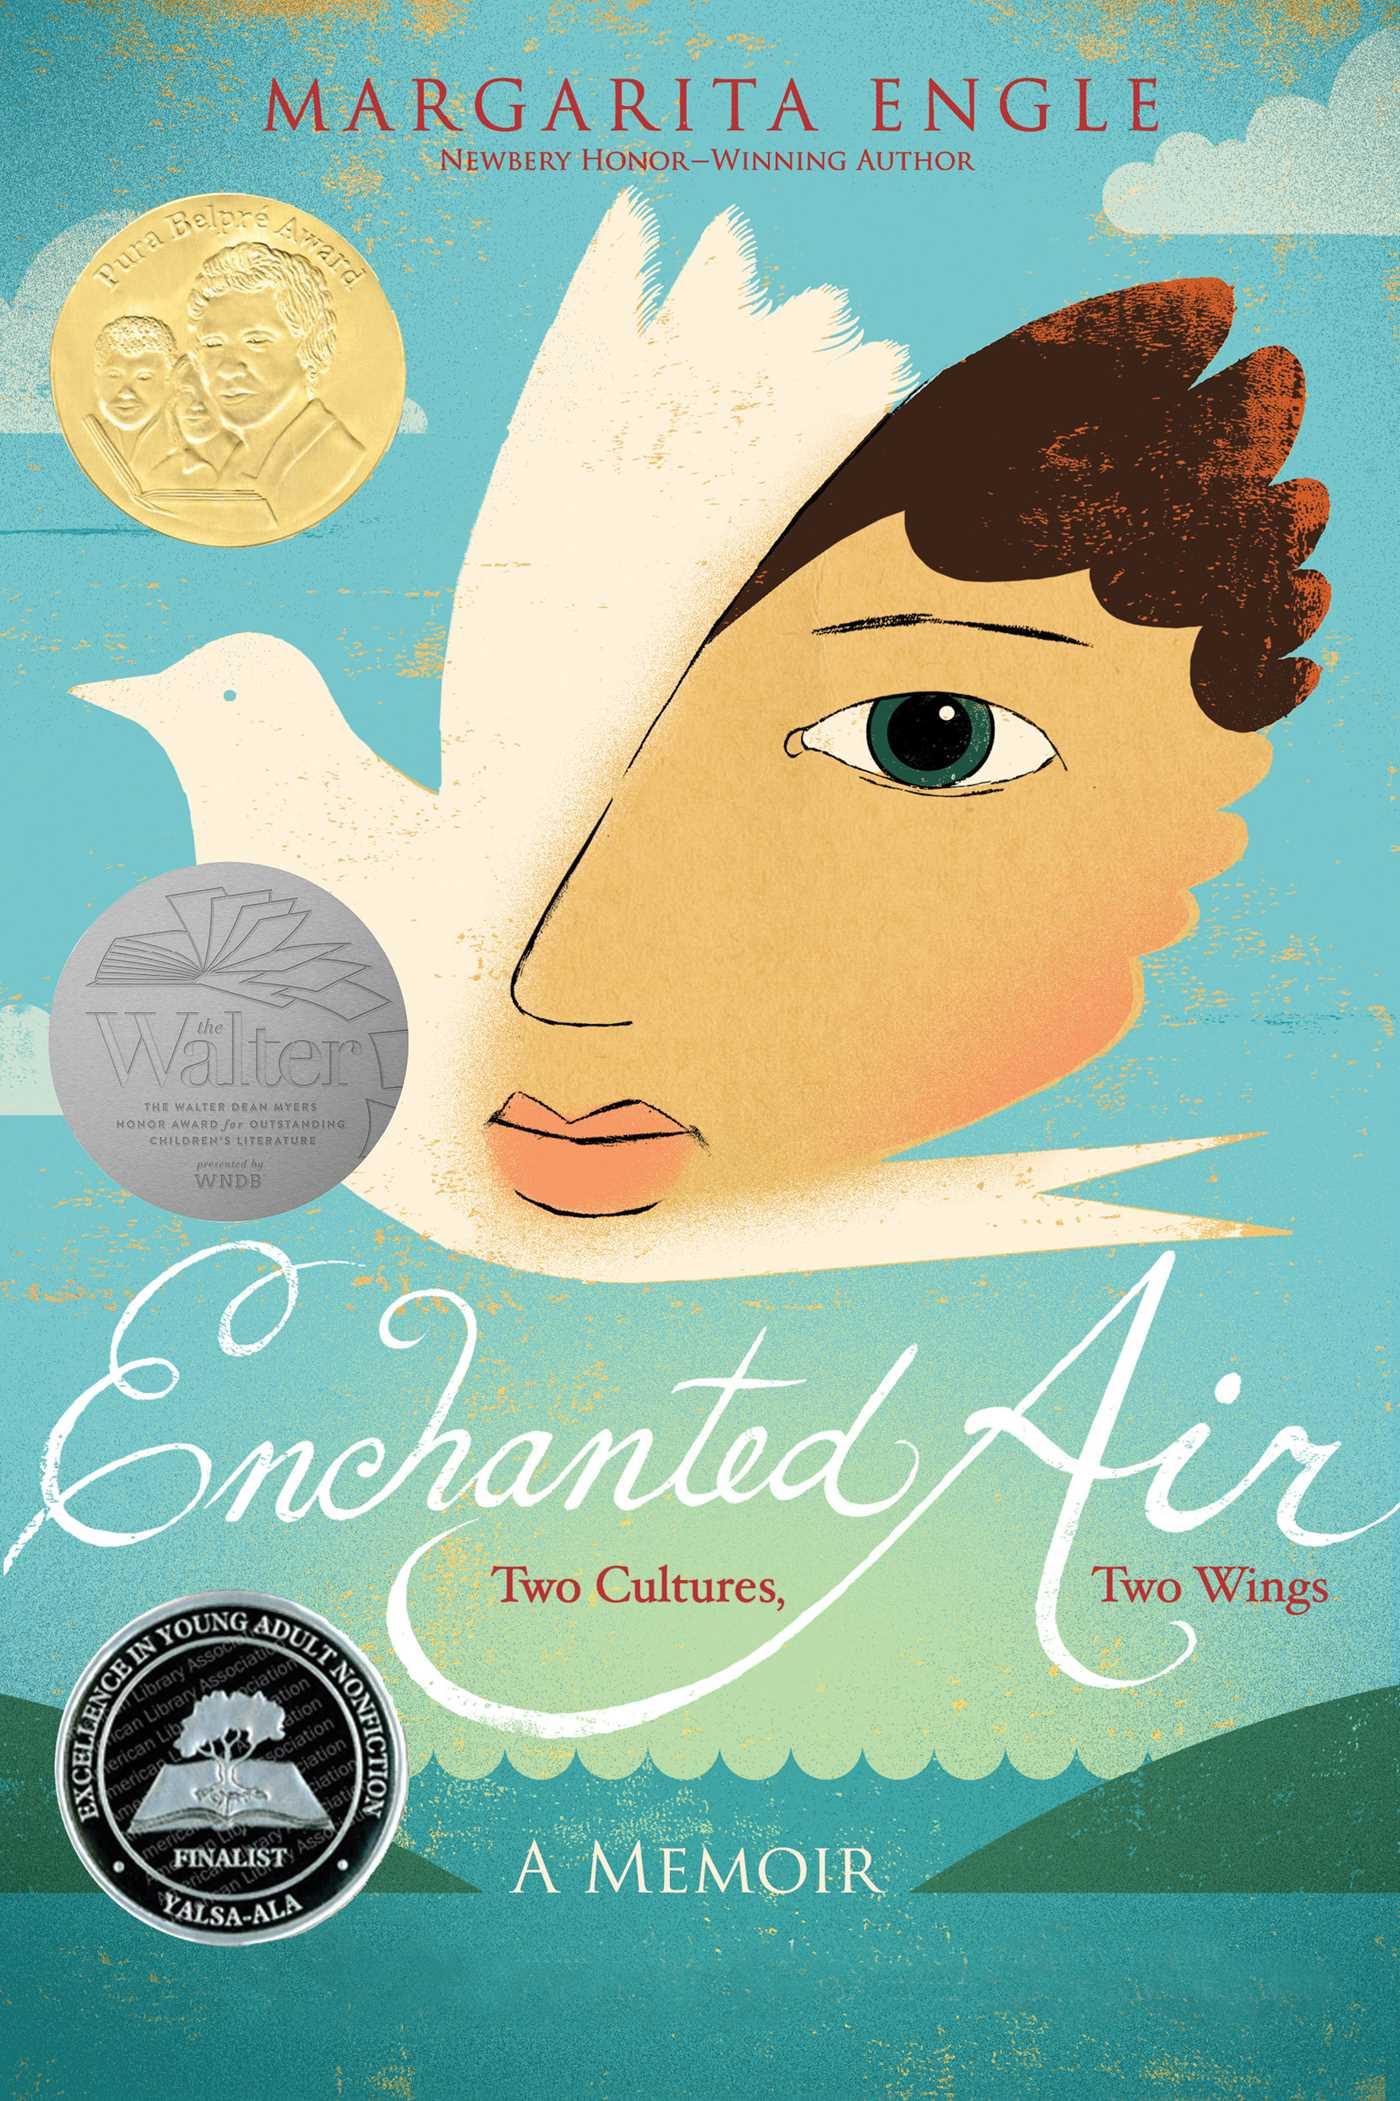 Enchanted Air Two Cultures, Two Wings: A Memoir